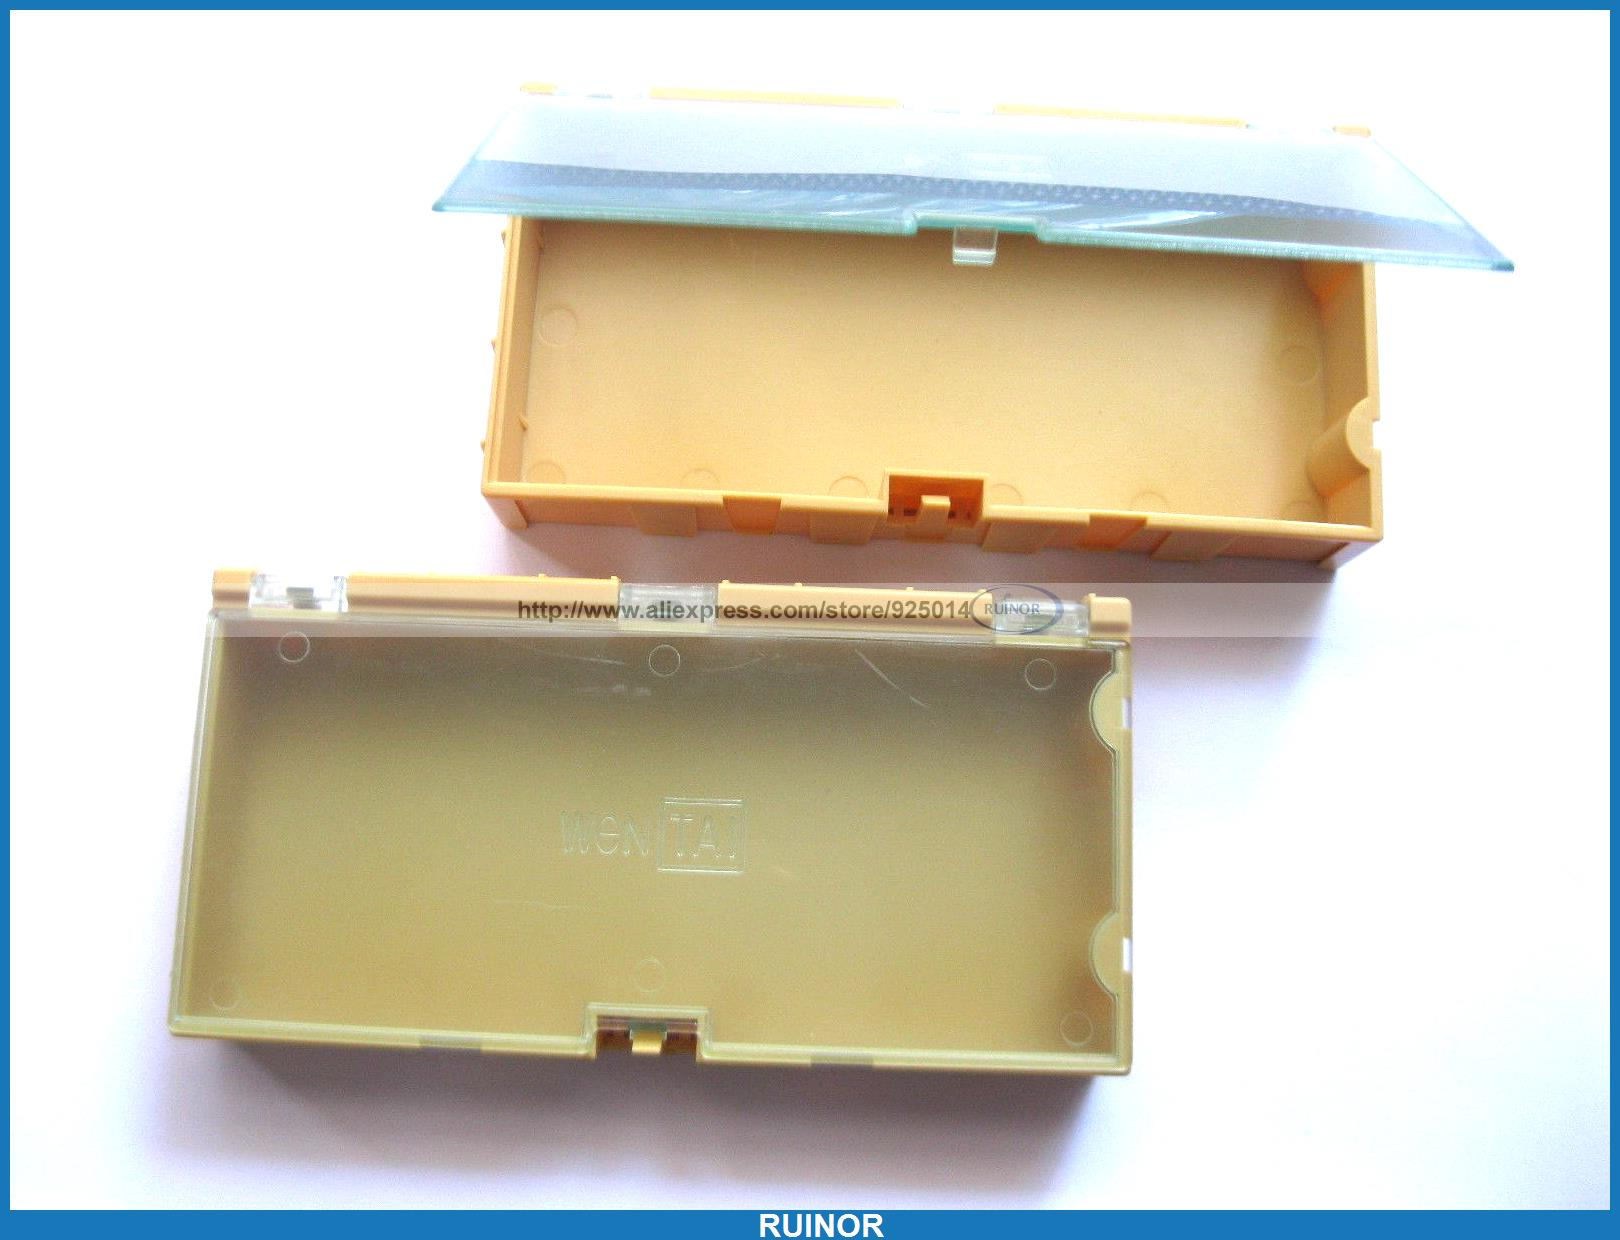 12 Pcs SMD SMT Electronic Component Storage Box Yellow 12 pcs smd smt electronic component storage box yellow